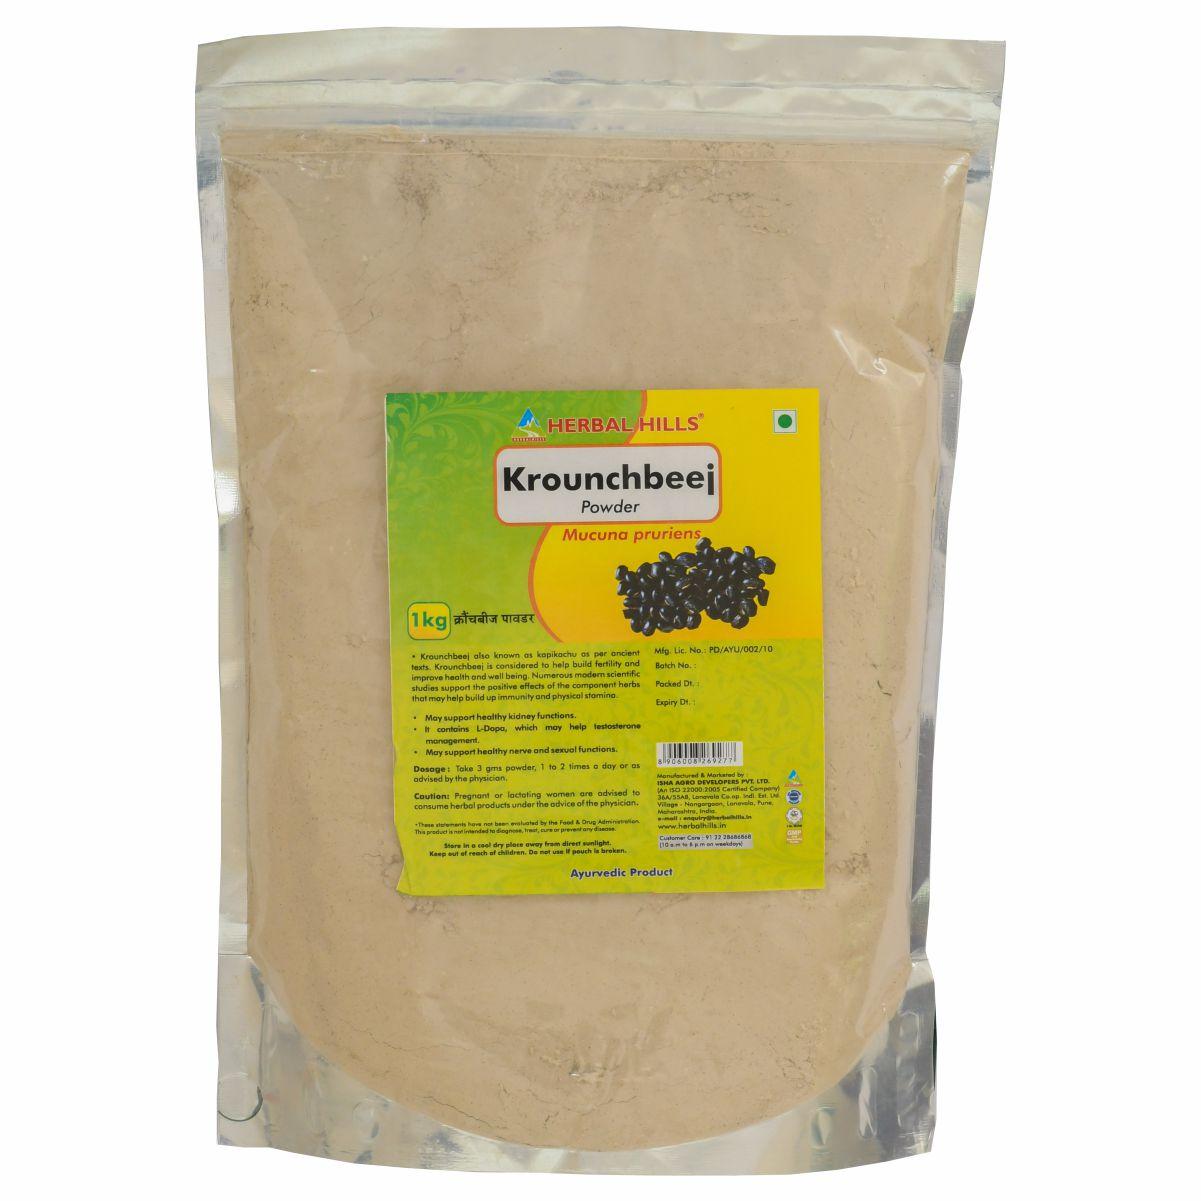 Ayurveda for men's health & vitality - 5 kg Krounchbeej Powder